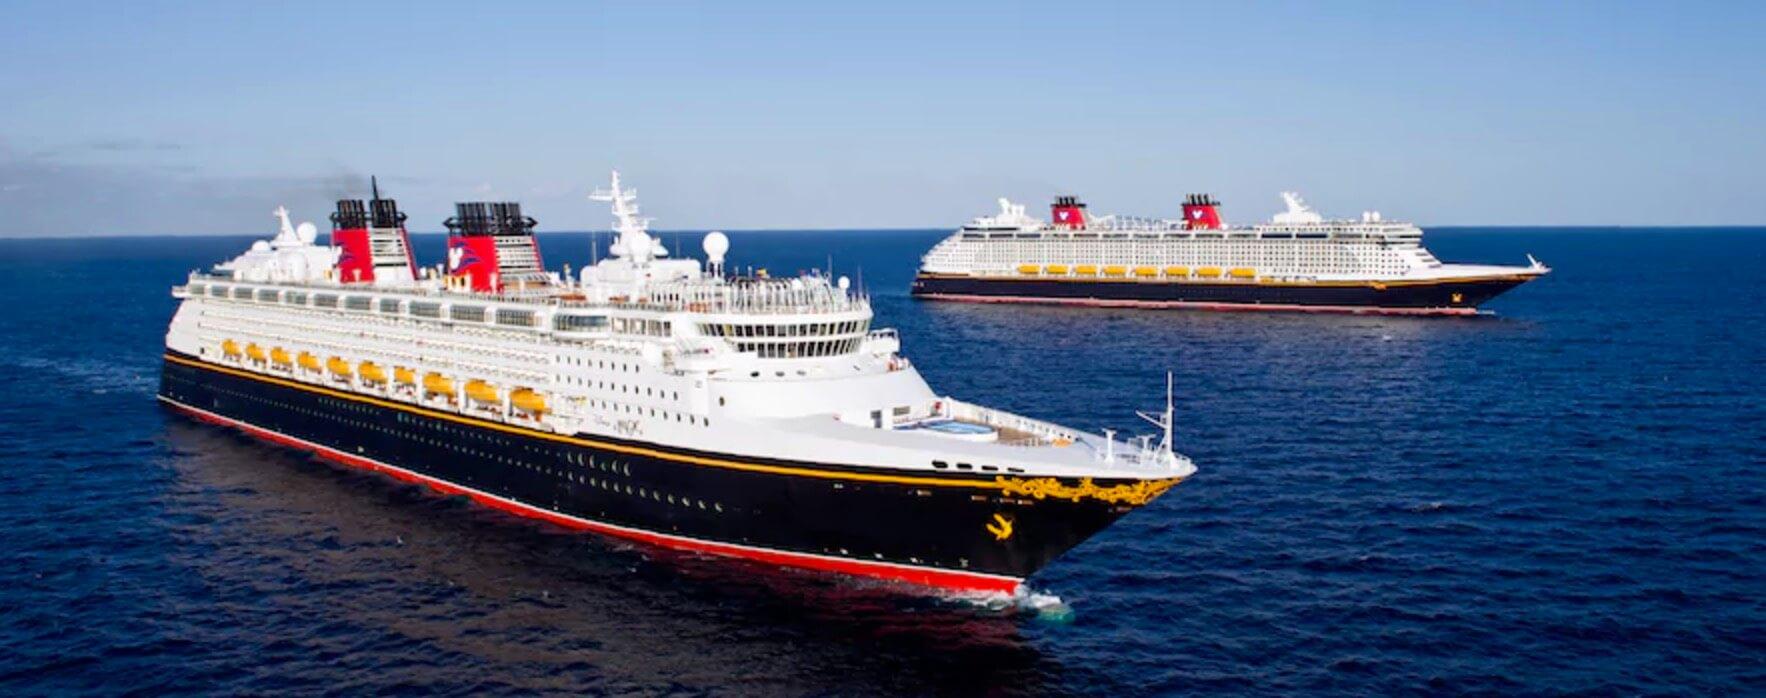 Royal Caribbean selling Legend of the Seas - Orlando Sentinel  Orlando Cruise Ship